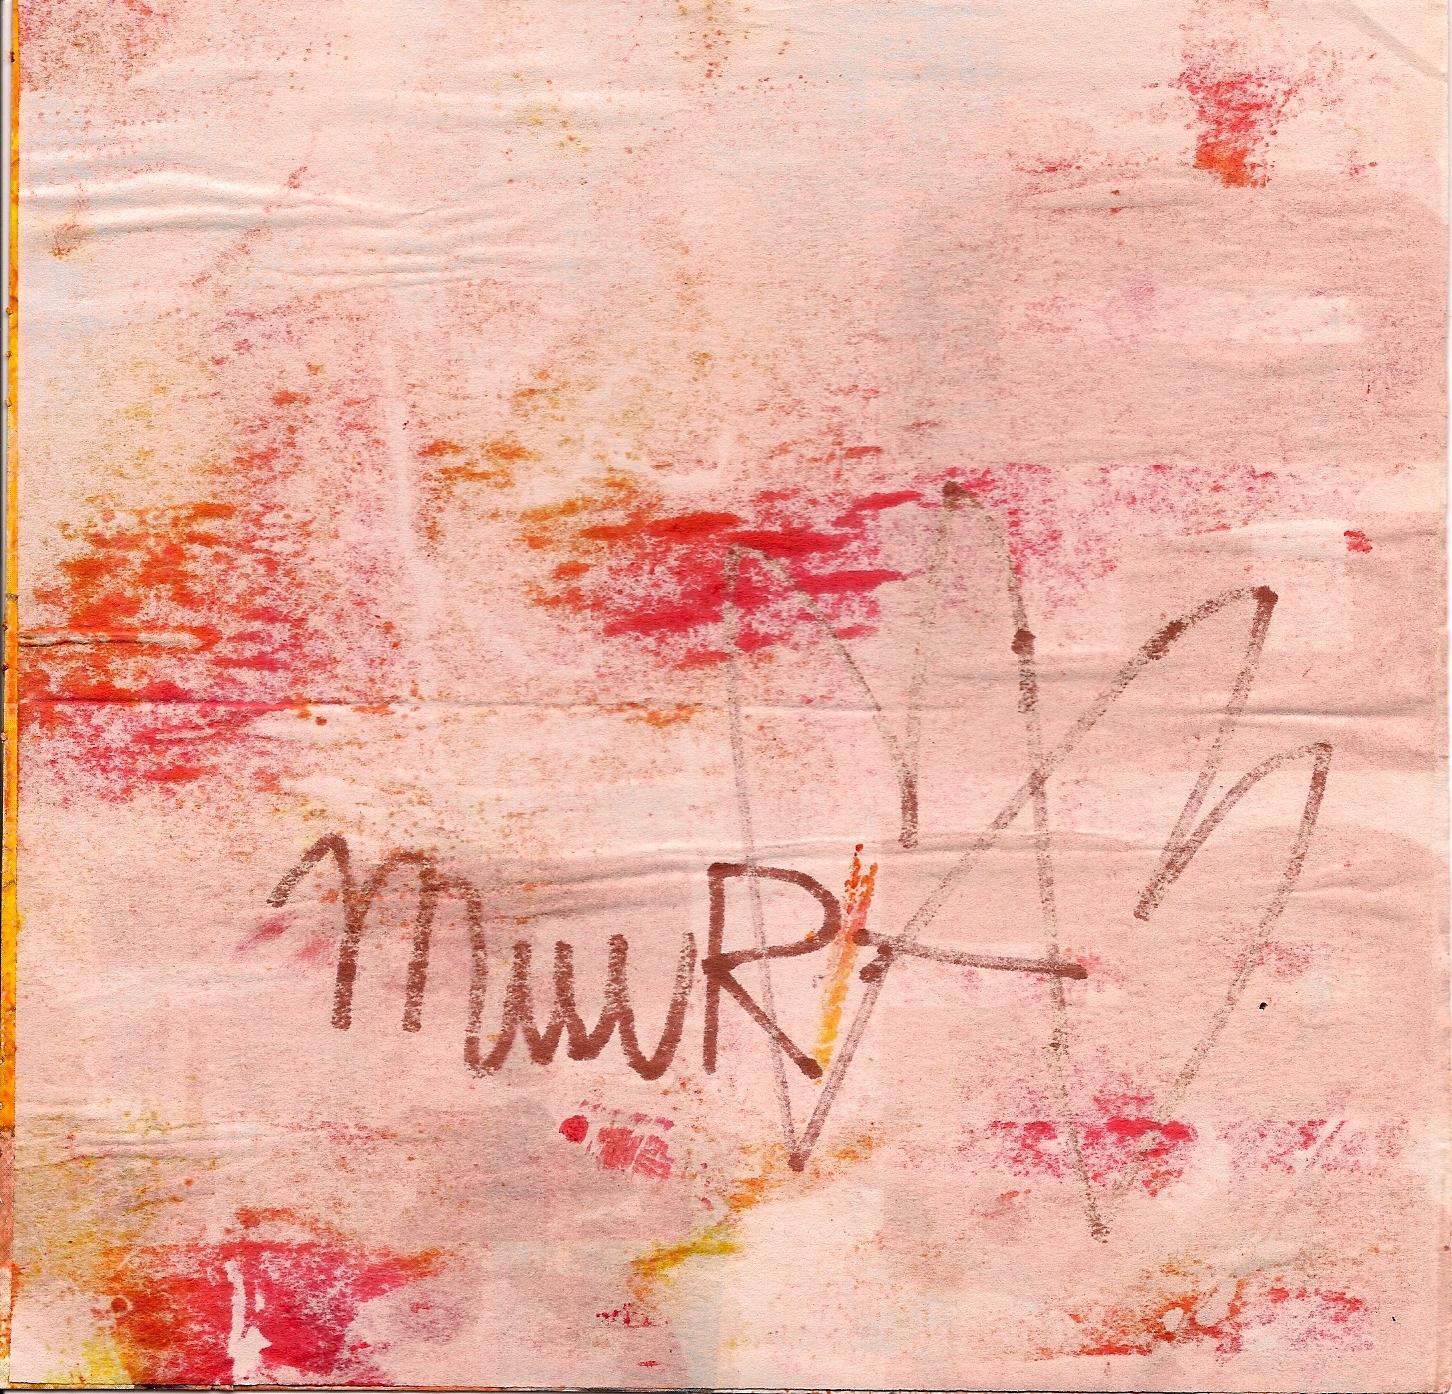 Muura1